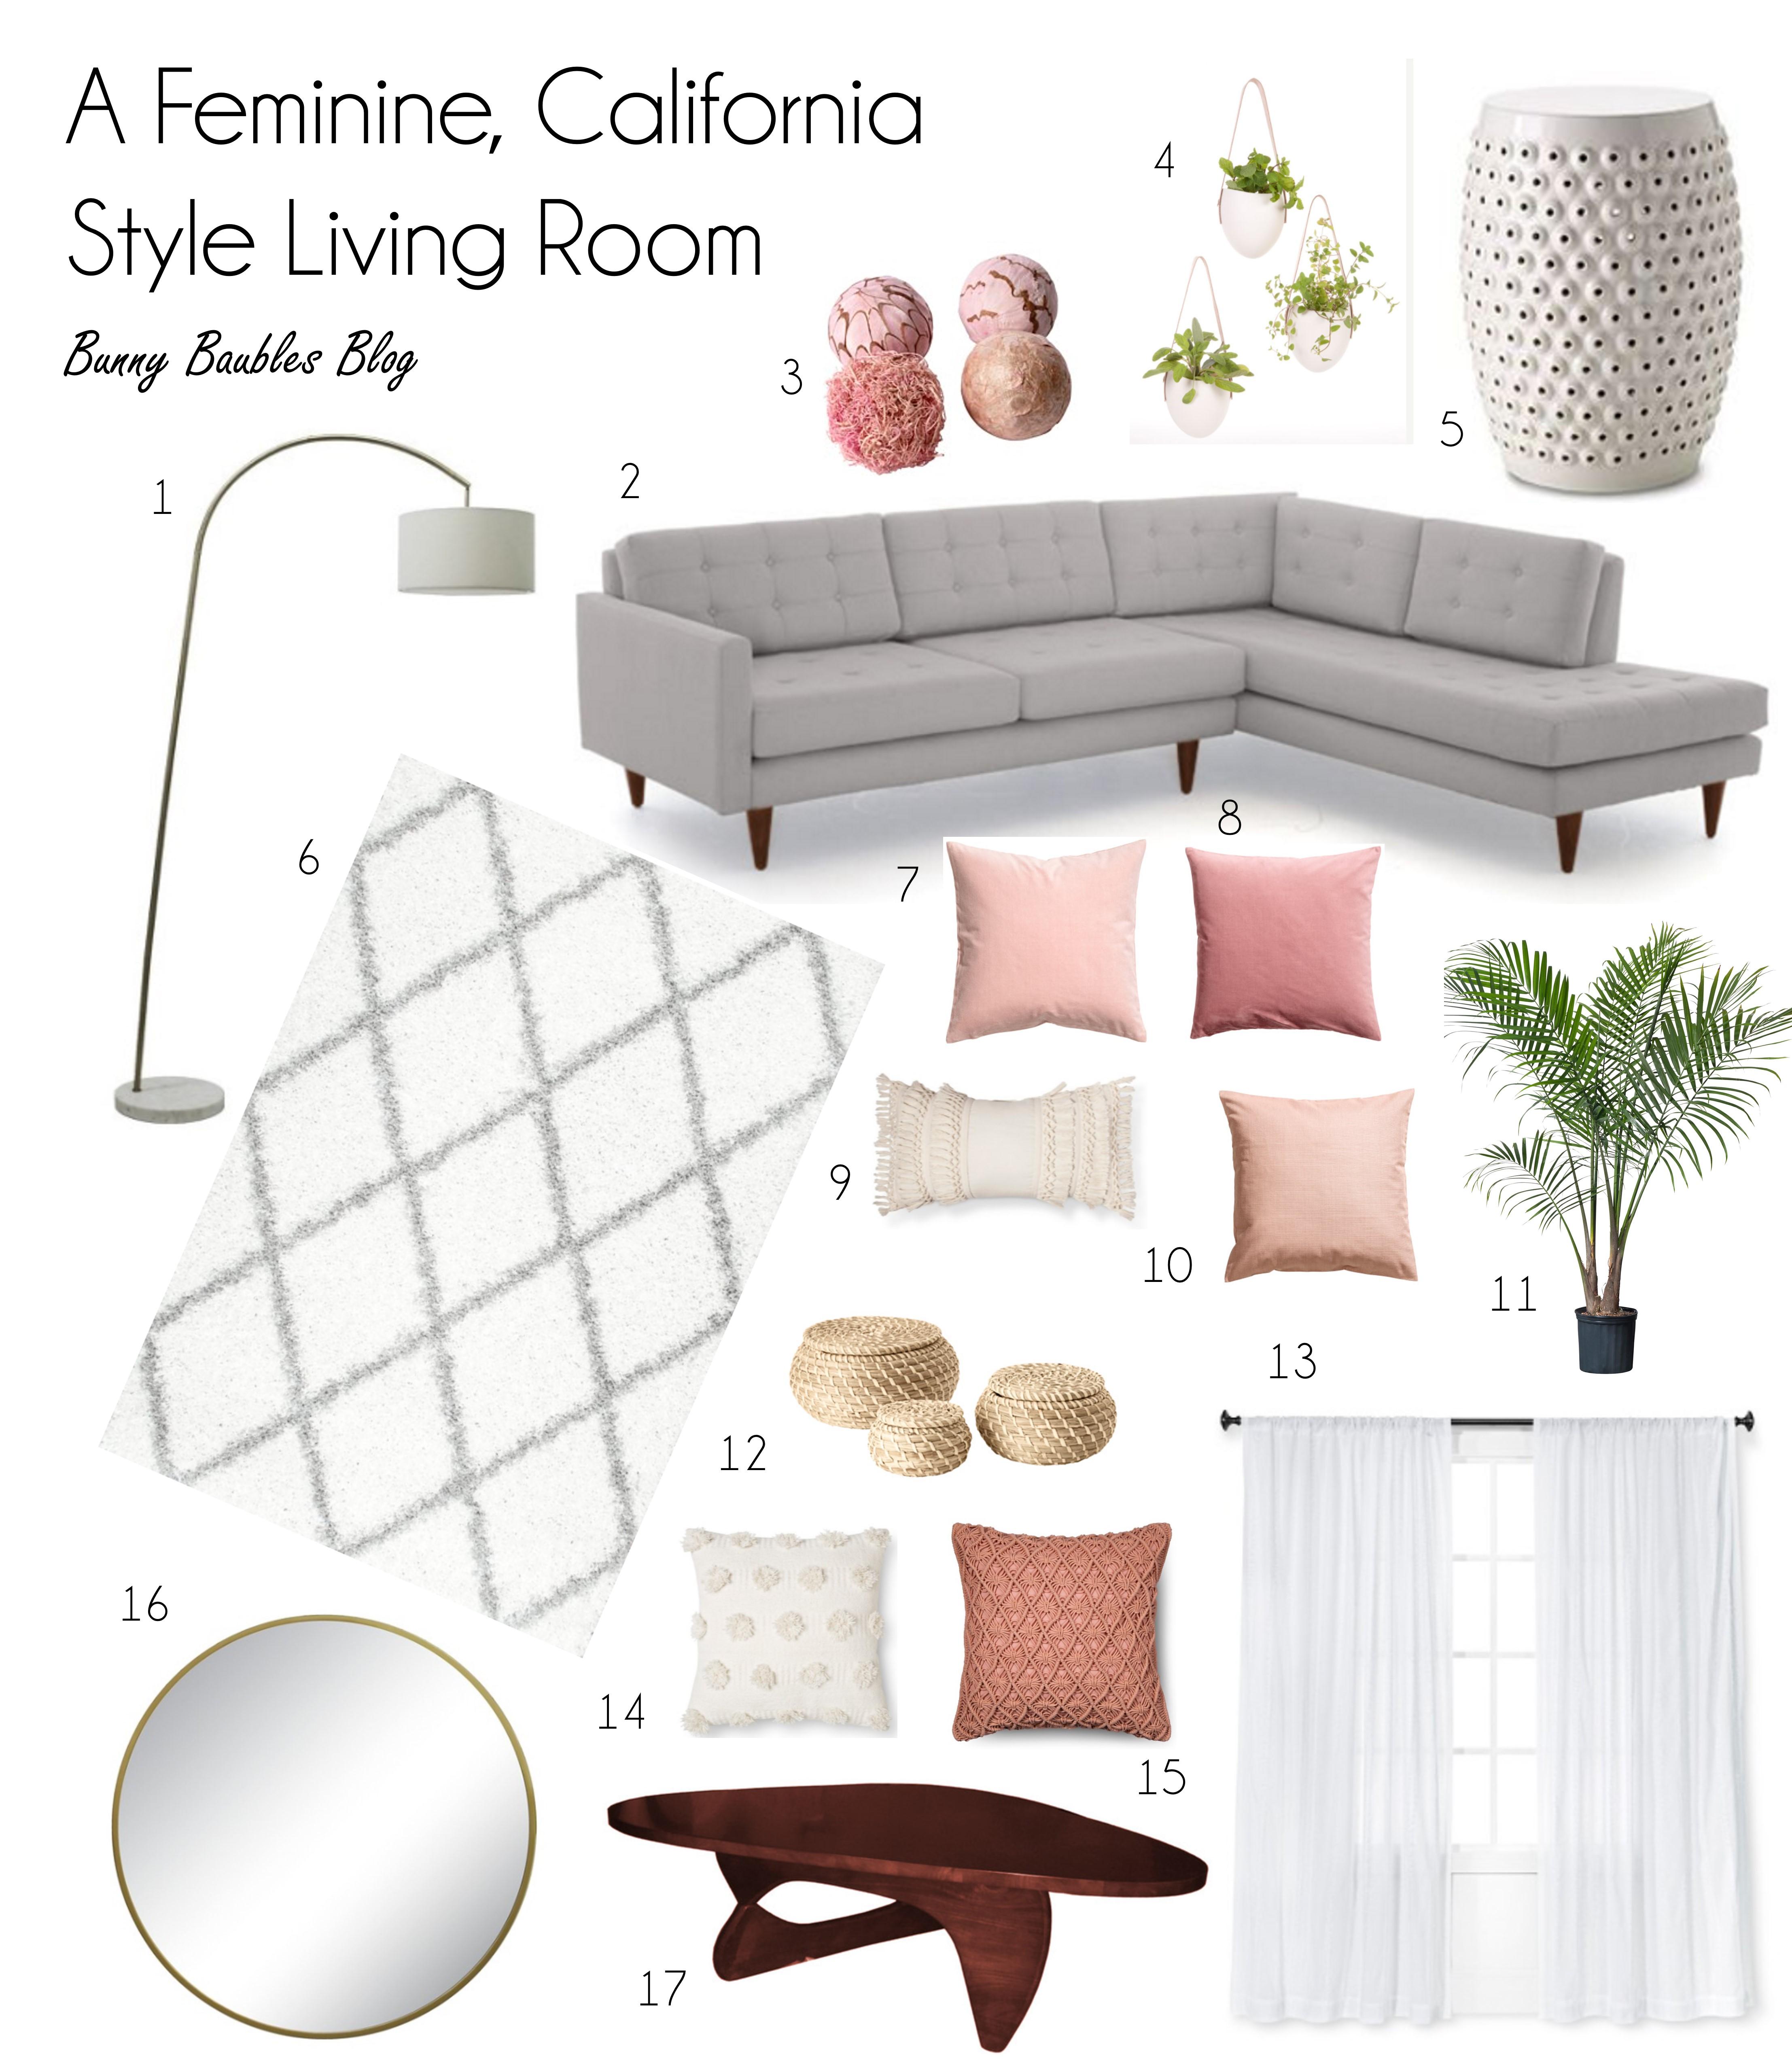 A Feminine California Style Living Room – Bunny Baubles